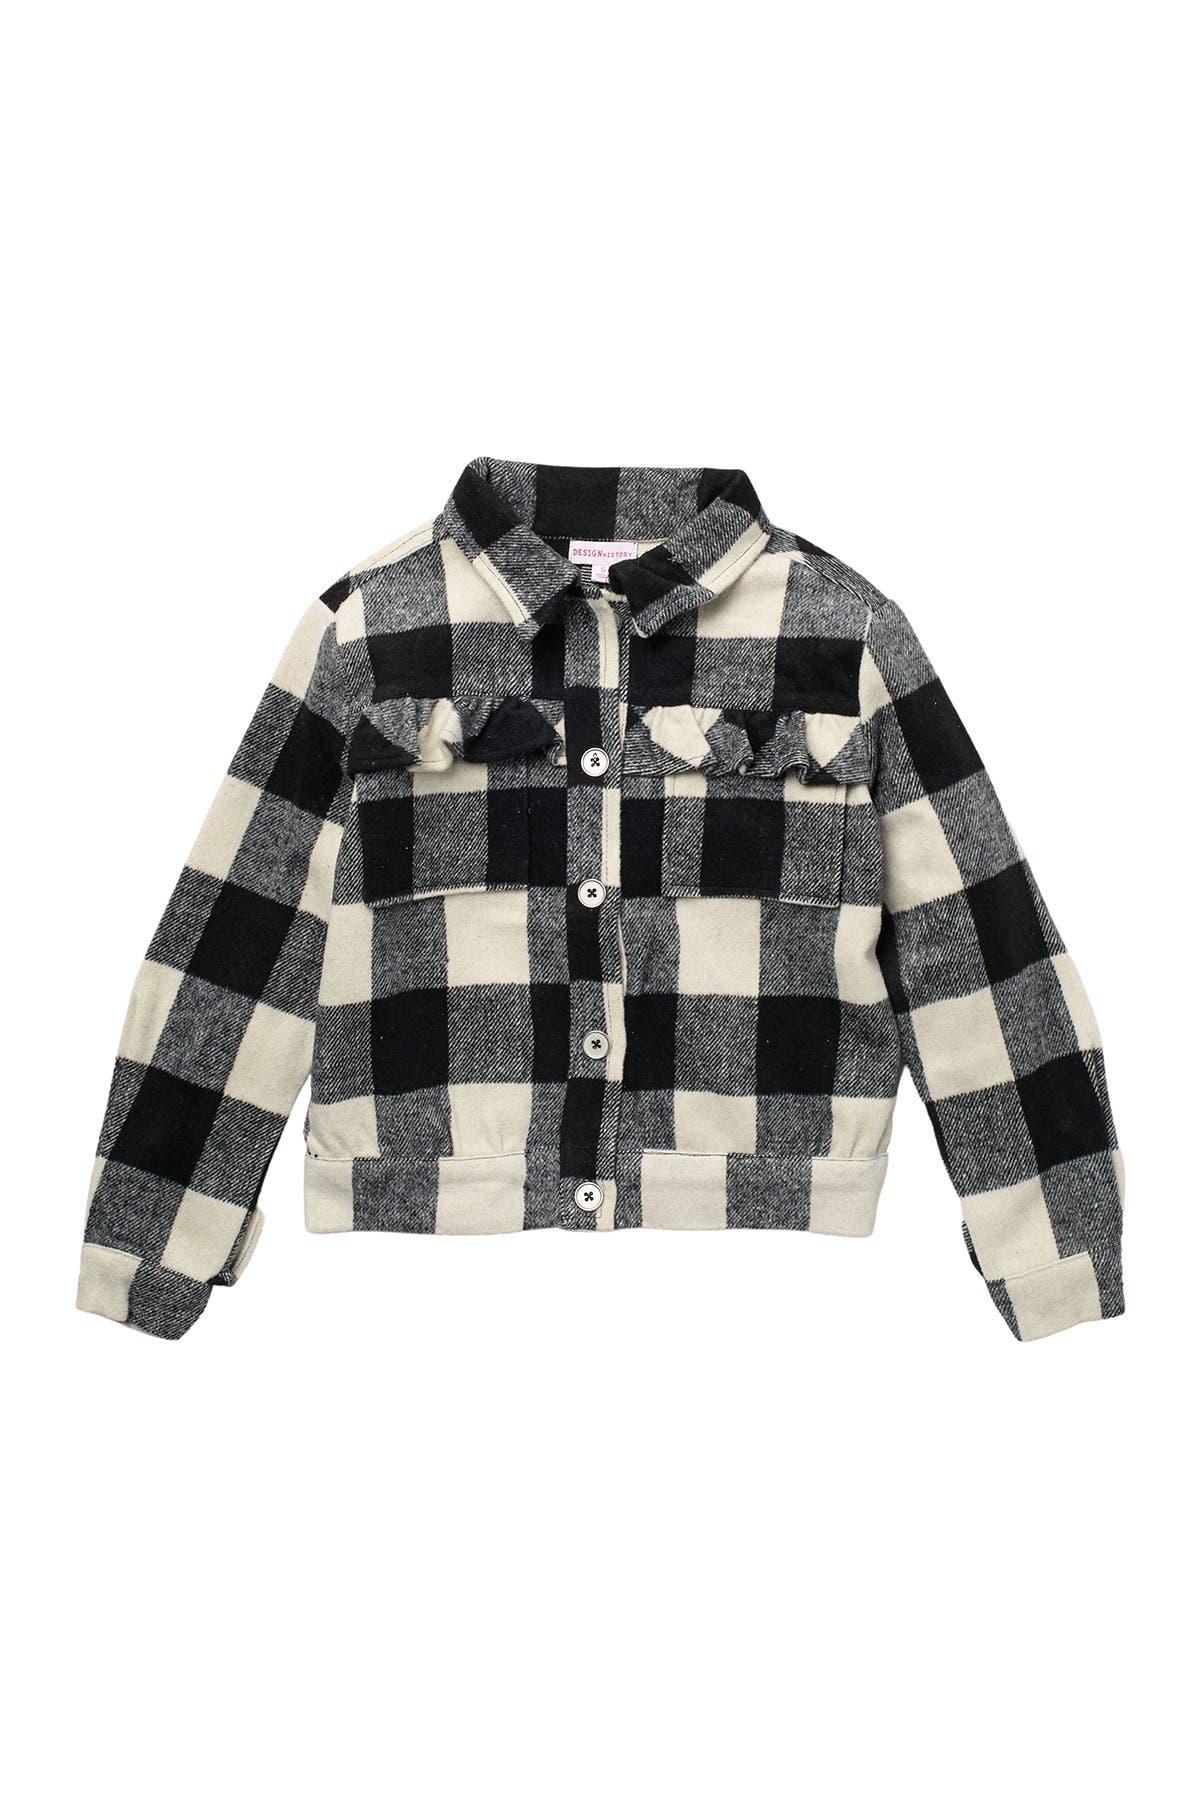 Image of Design History Plaid Print Long Sleeve Jacket